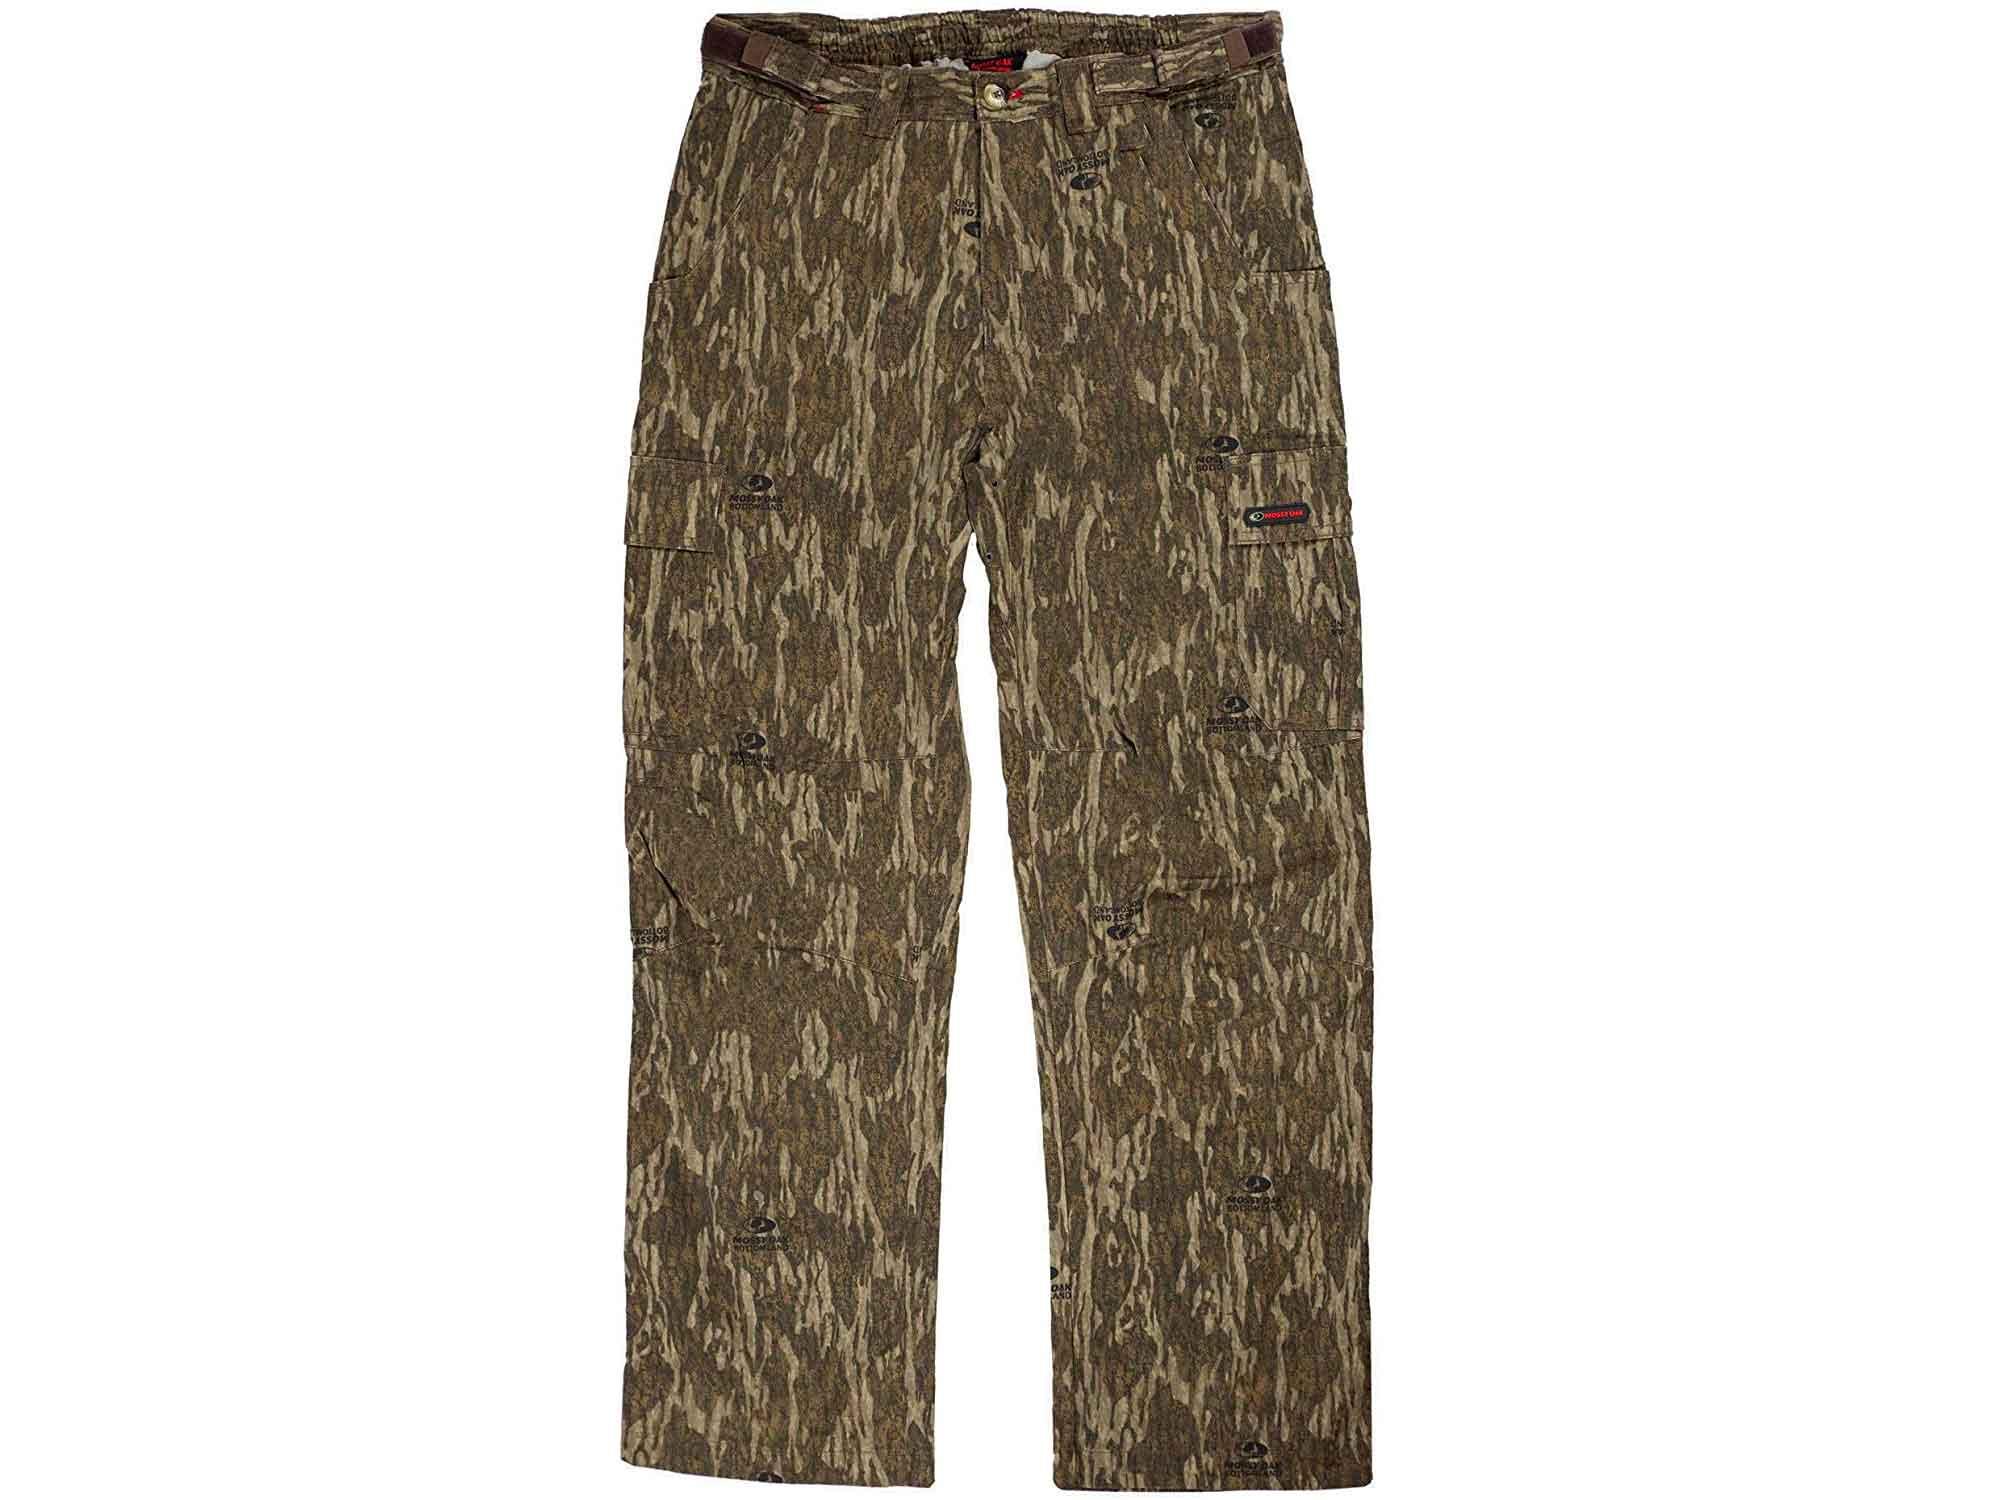 Mossy Oak Men's Cotton Mill 2.0 Hunt Pant